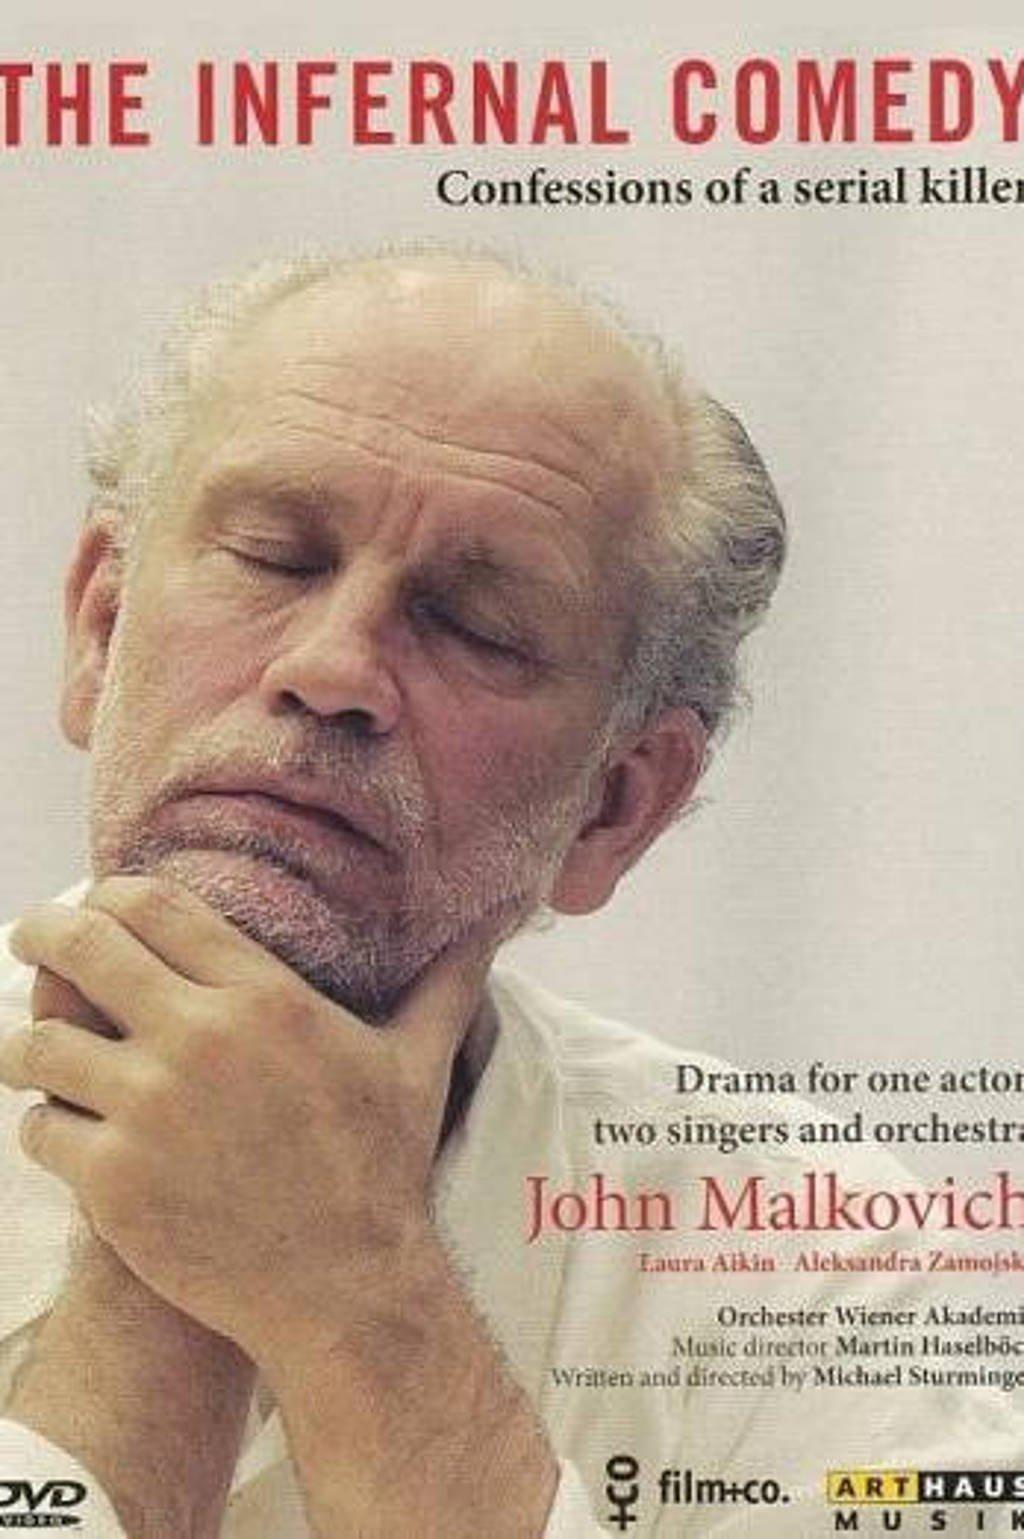 John Malcovich,Laura Aikin,Zamojska - The Infernal Comedy,Confessions Of (DVD)